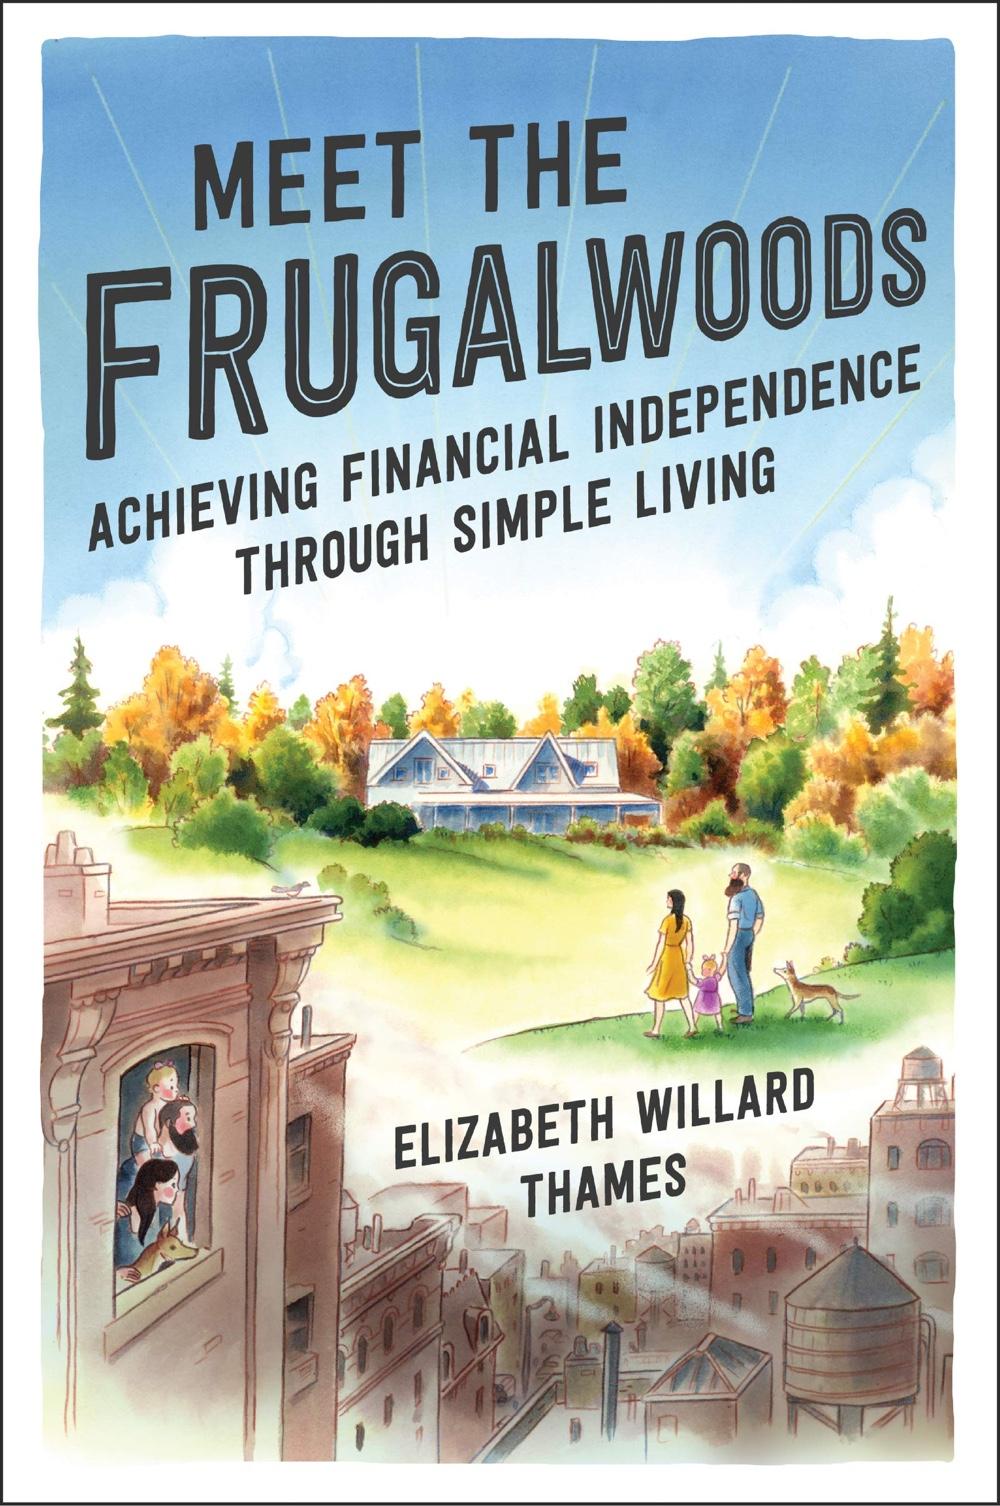 Meet The Frugalwoods by Elizabeth Willard Thames | Audiobook Review